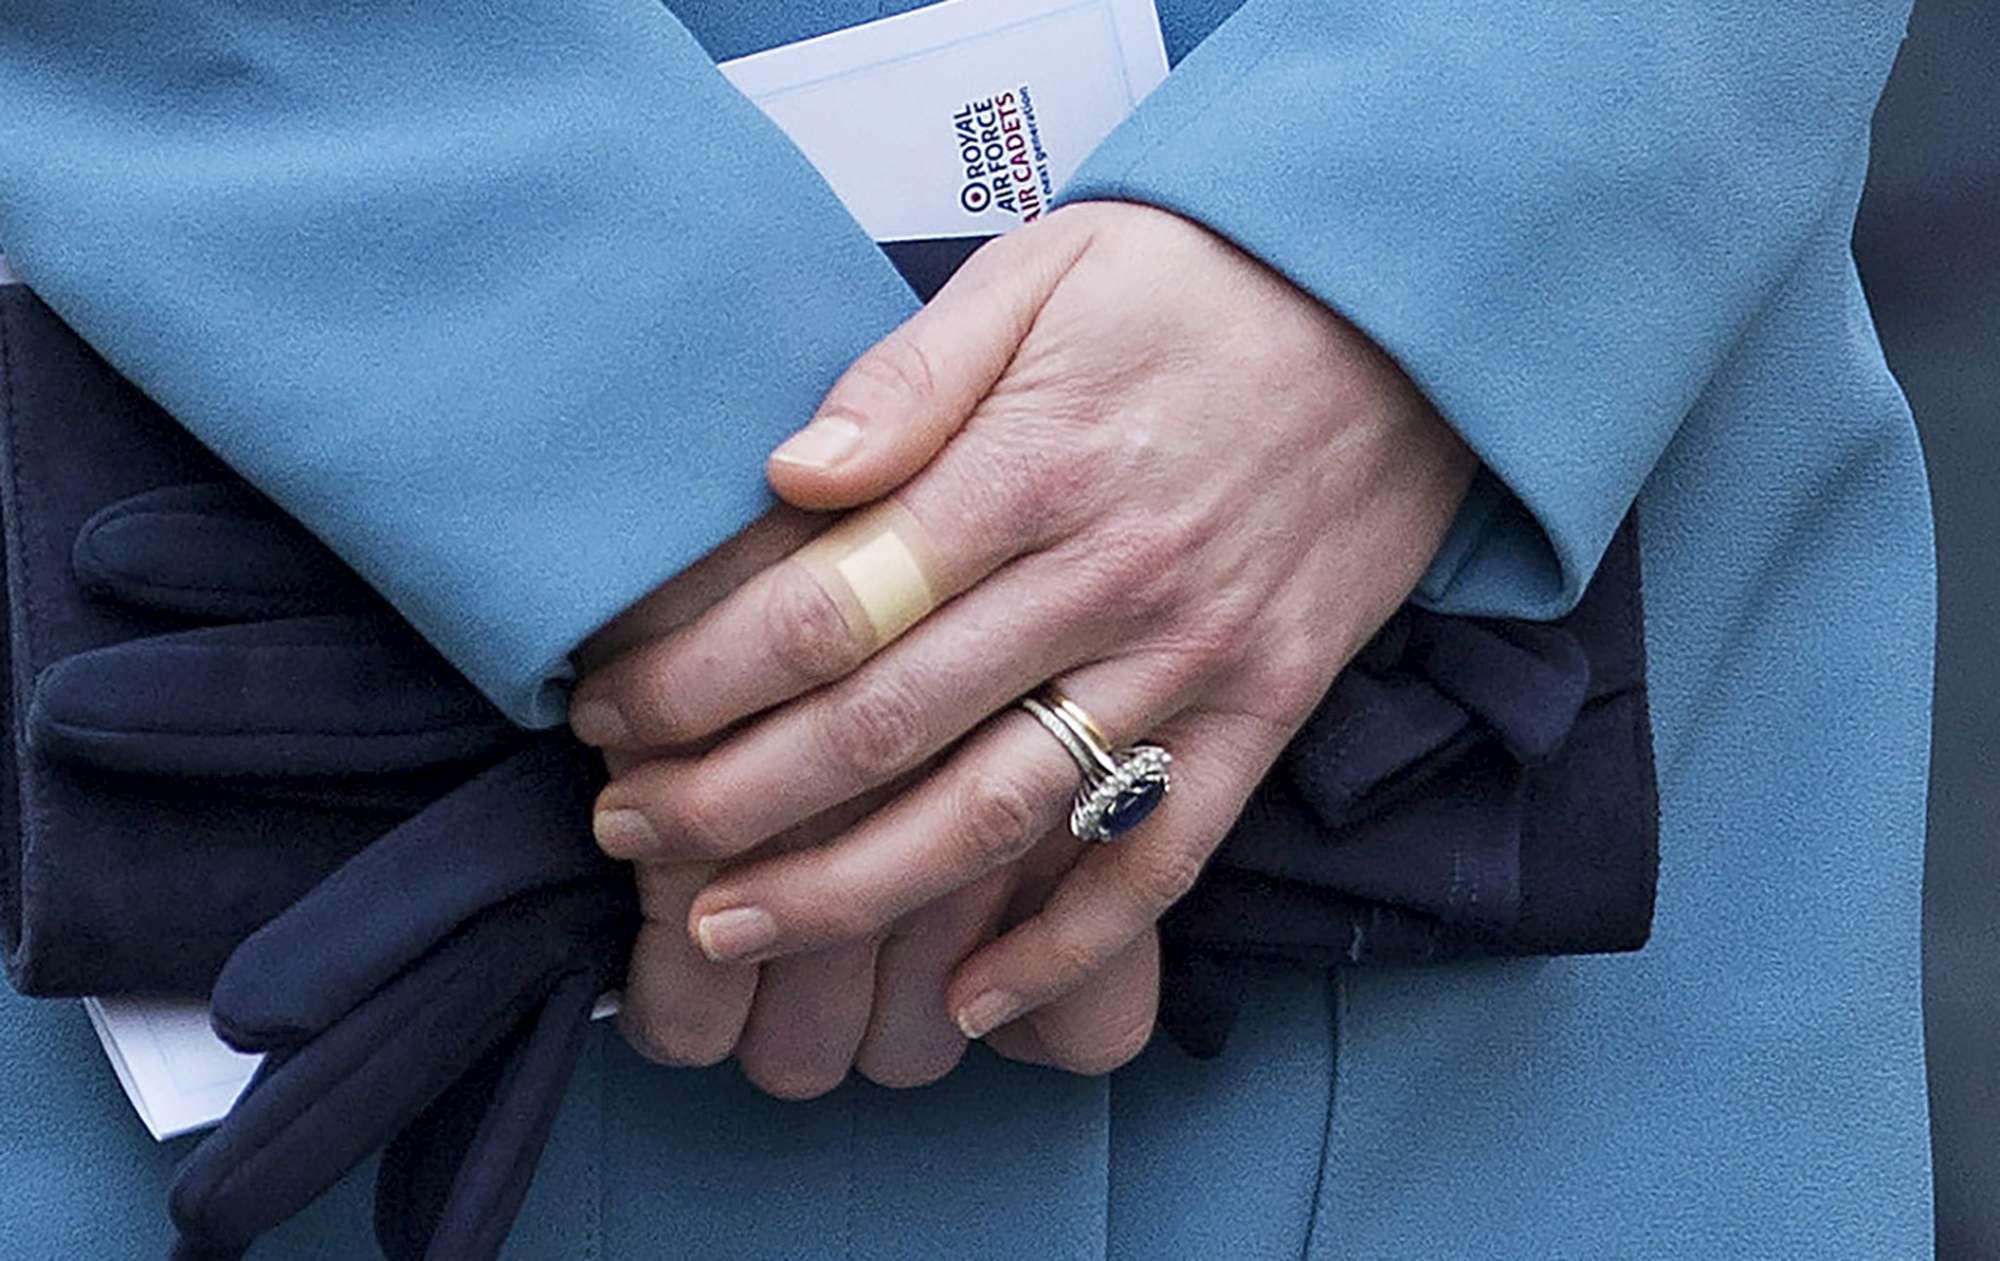 Kate Middleton ha sempre cerotti alle dita, perché?